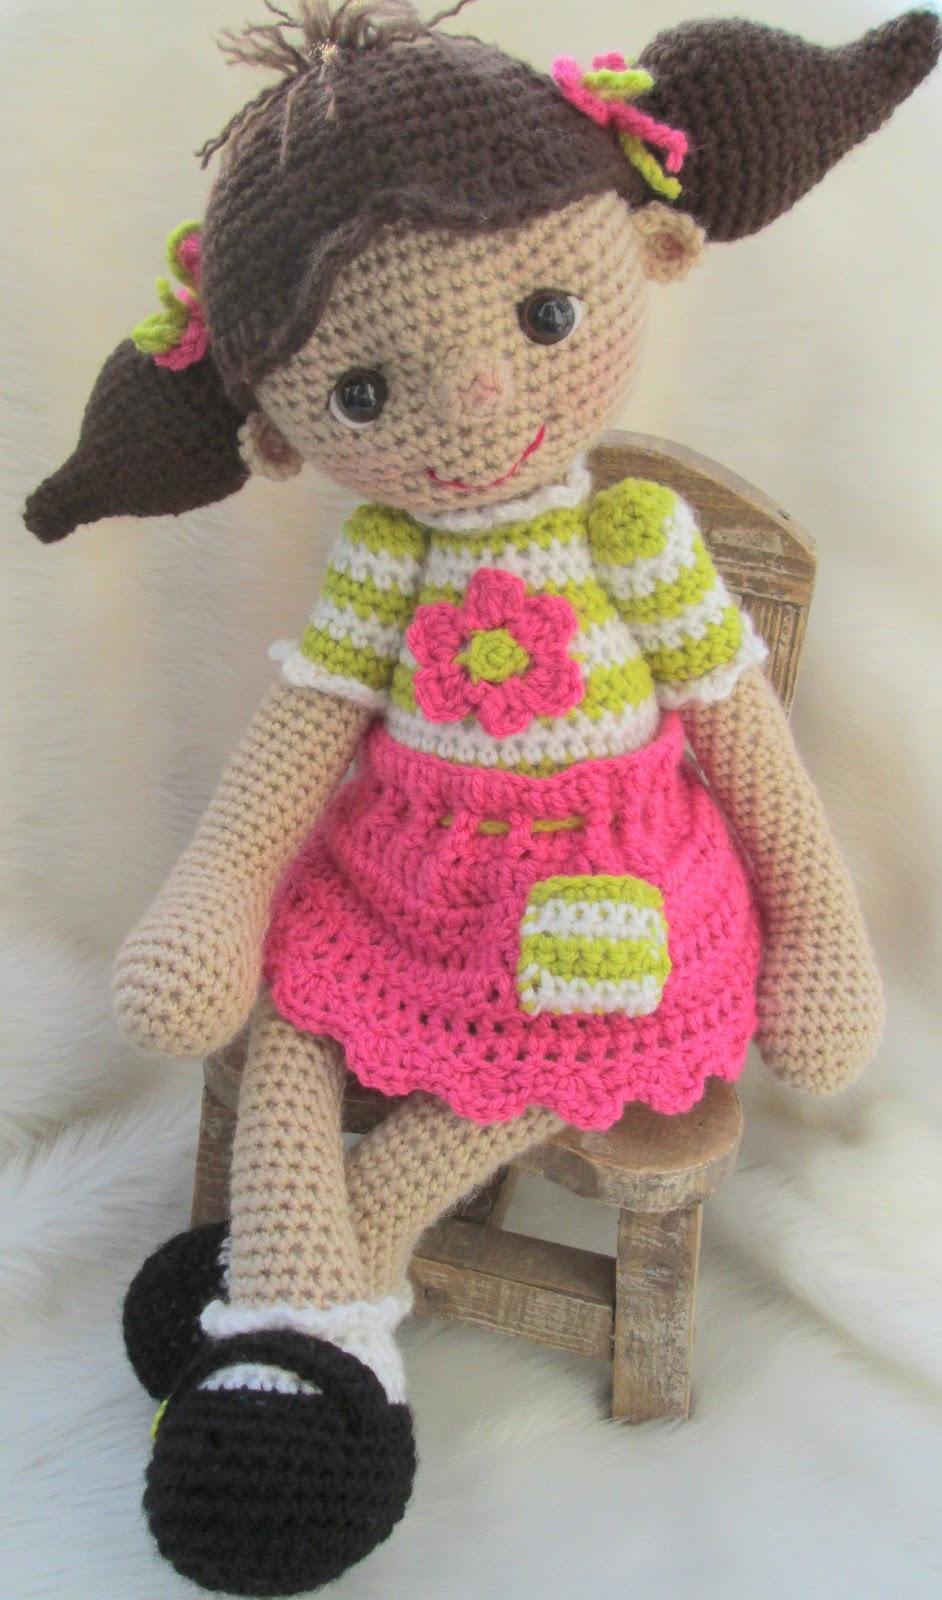 Teri S Blog So Cute Dolly A New Huggable Dolly Pattern